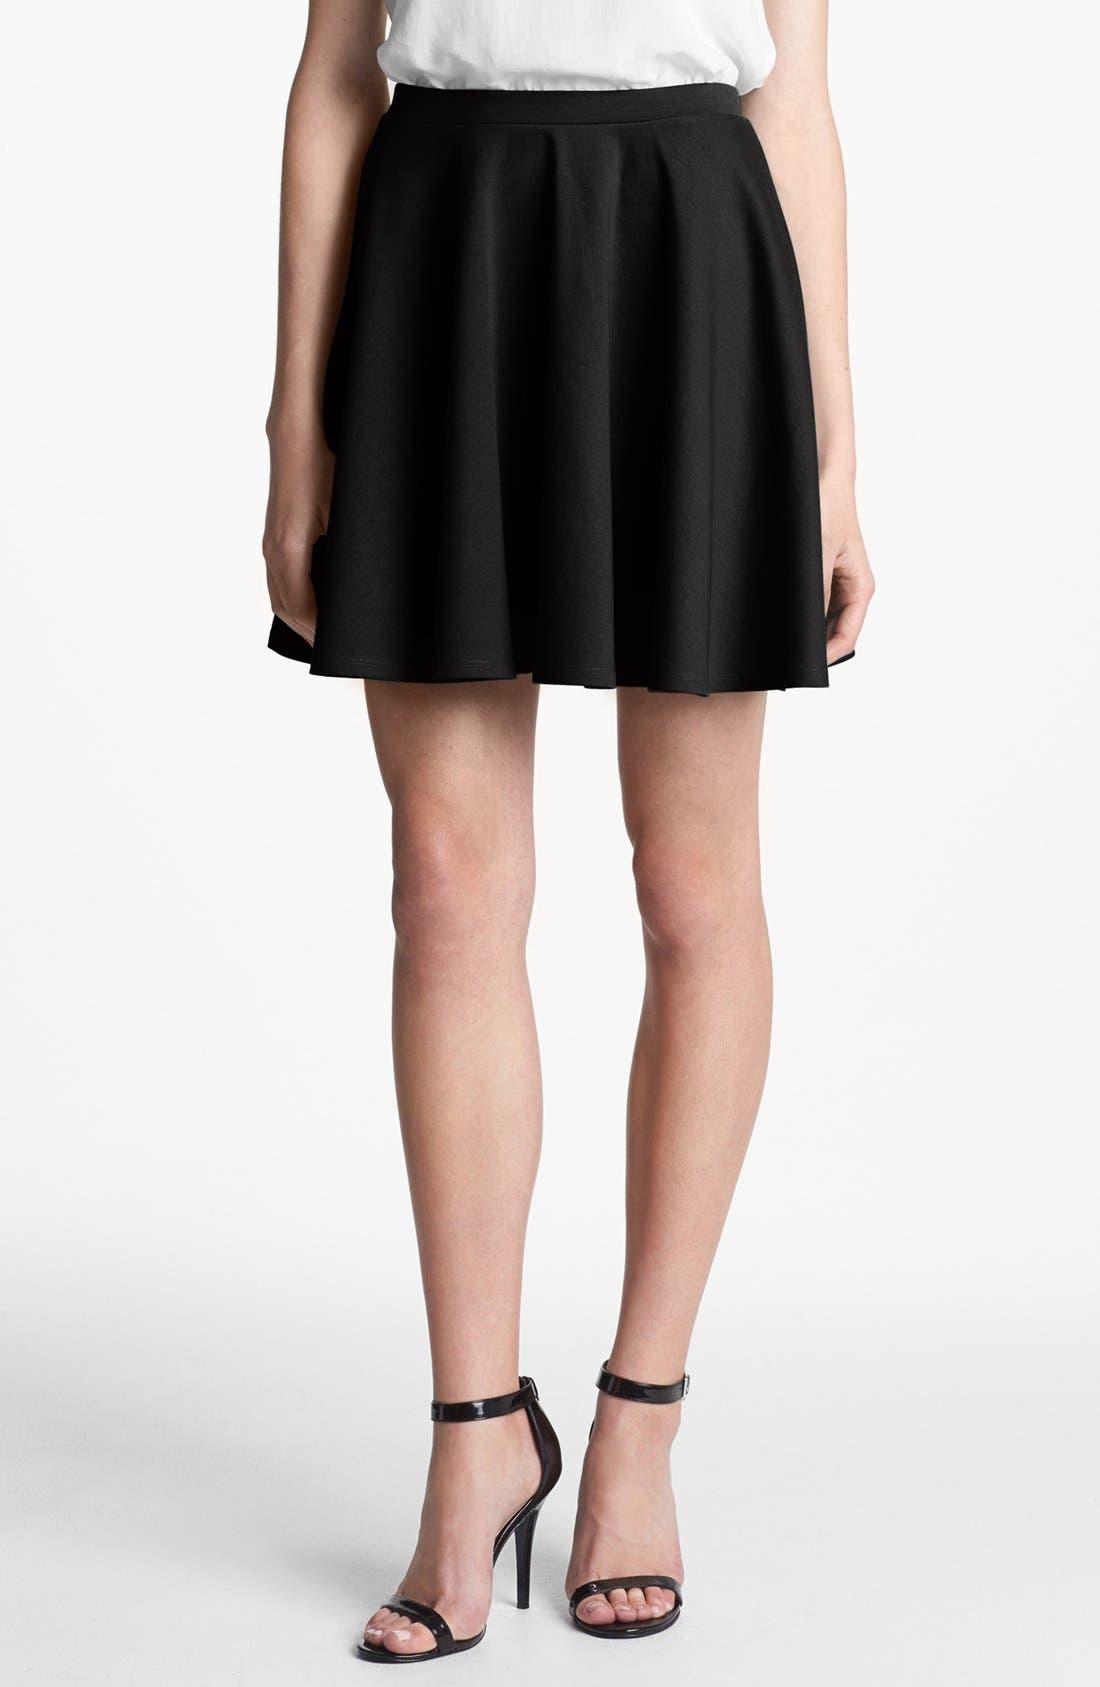 Alternate Image 1 Selected - Hinge® Ponte Knit Circle Skirt